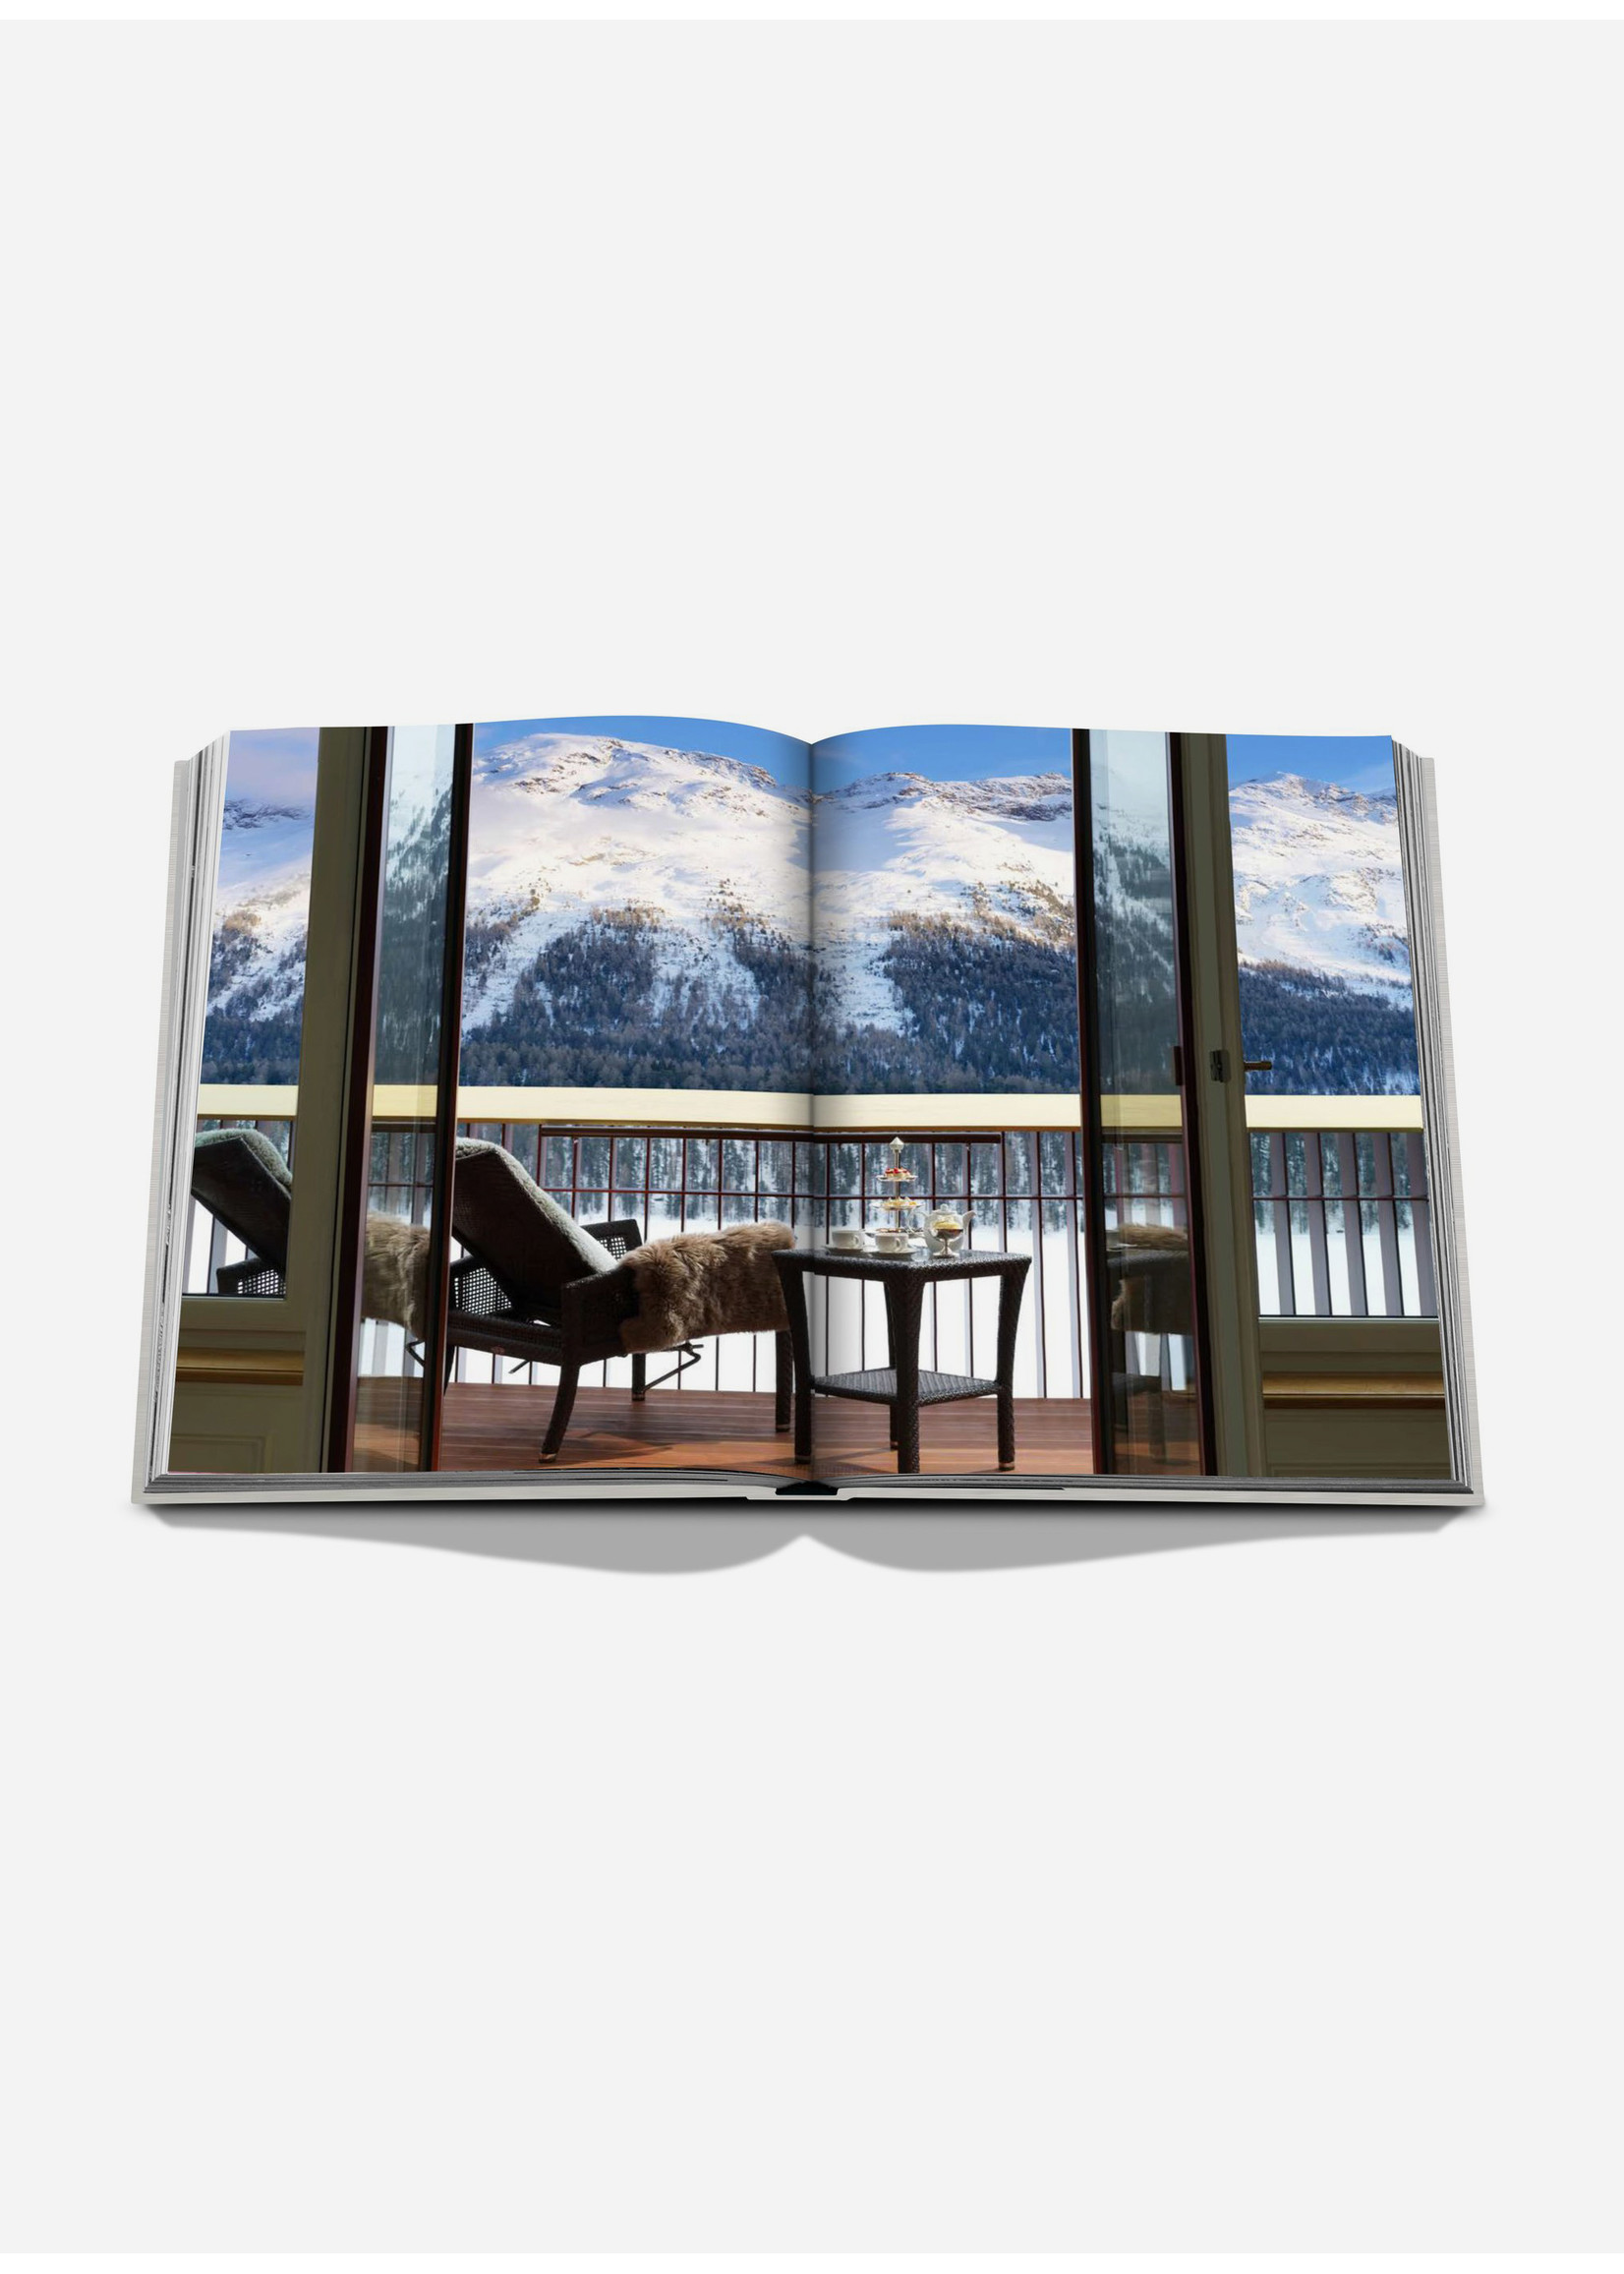 Assouline Books ST Moritz Chic